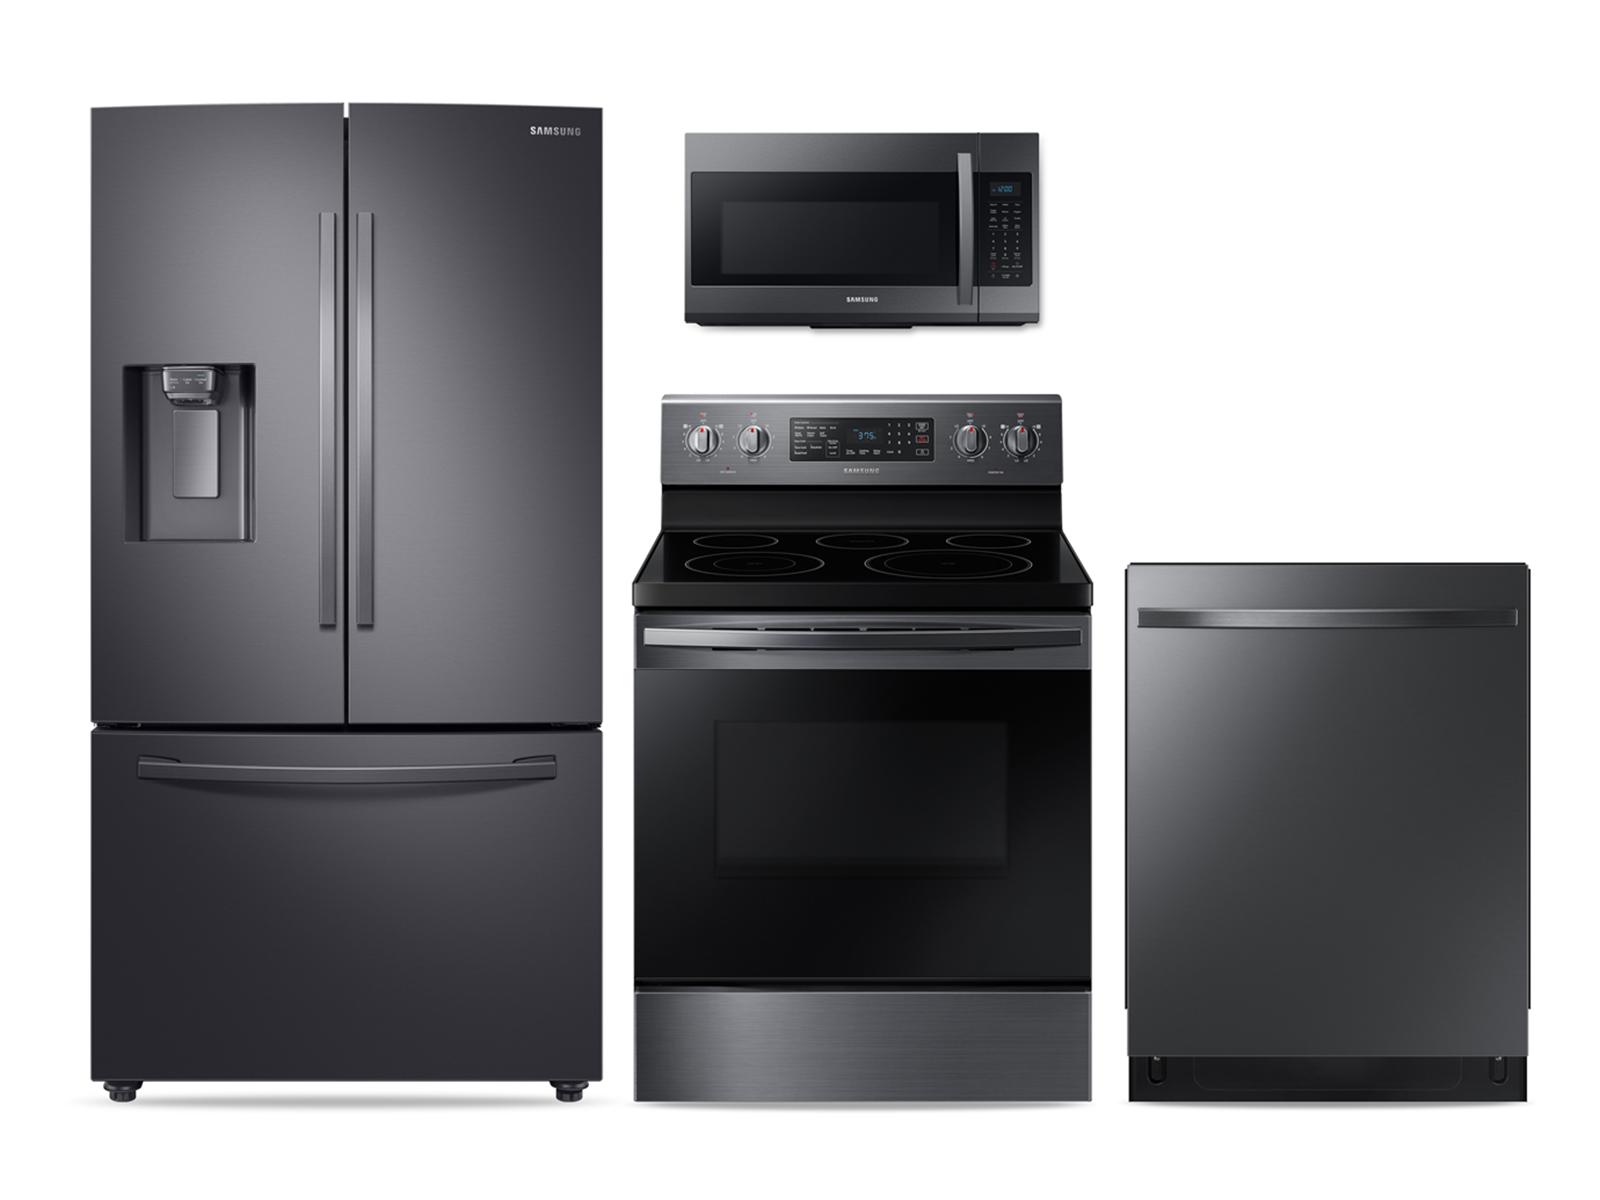 Samsung Large Capacity 3-door Refrigerator + Electric Range + StormWash Dishwasher + Microwave Kitchen Package in Black Stainless